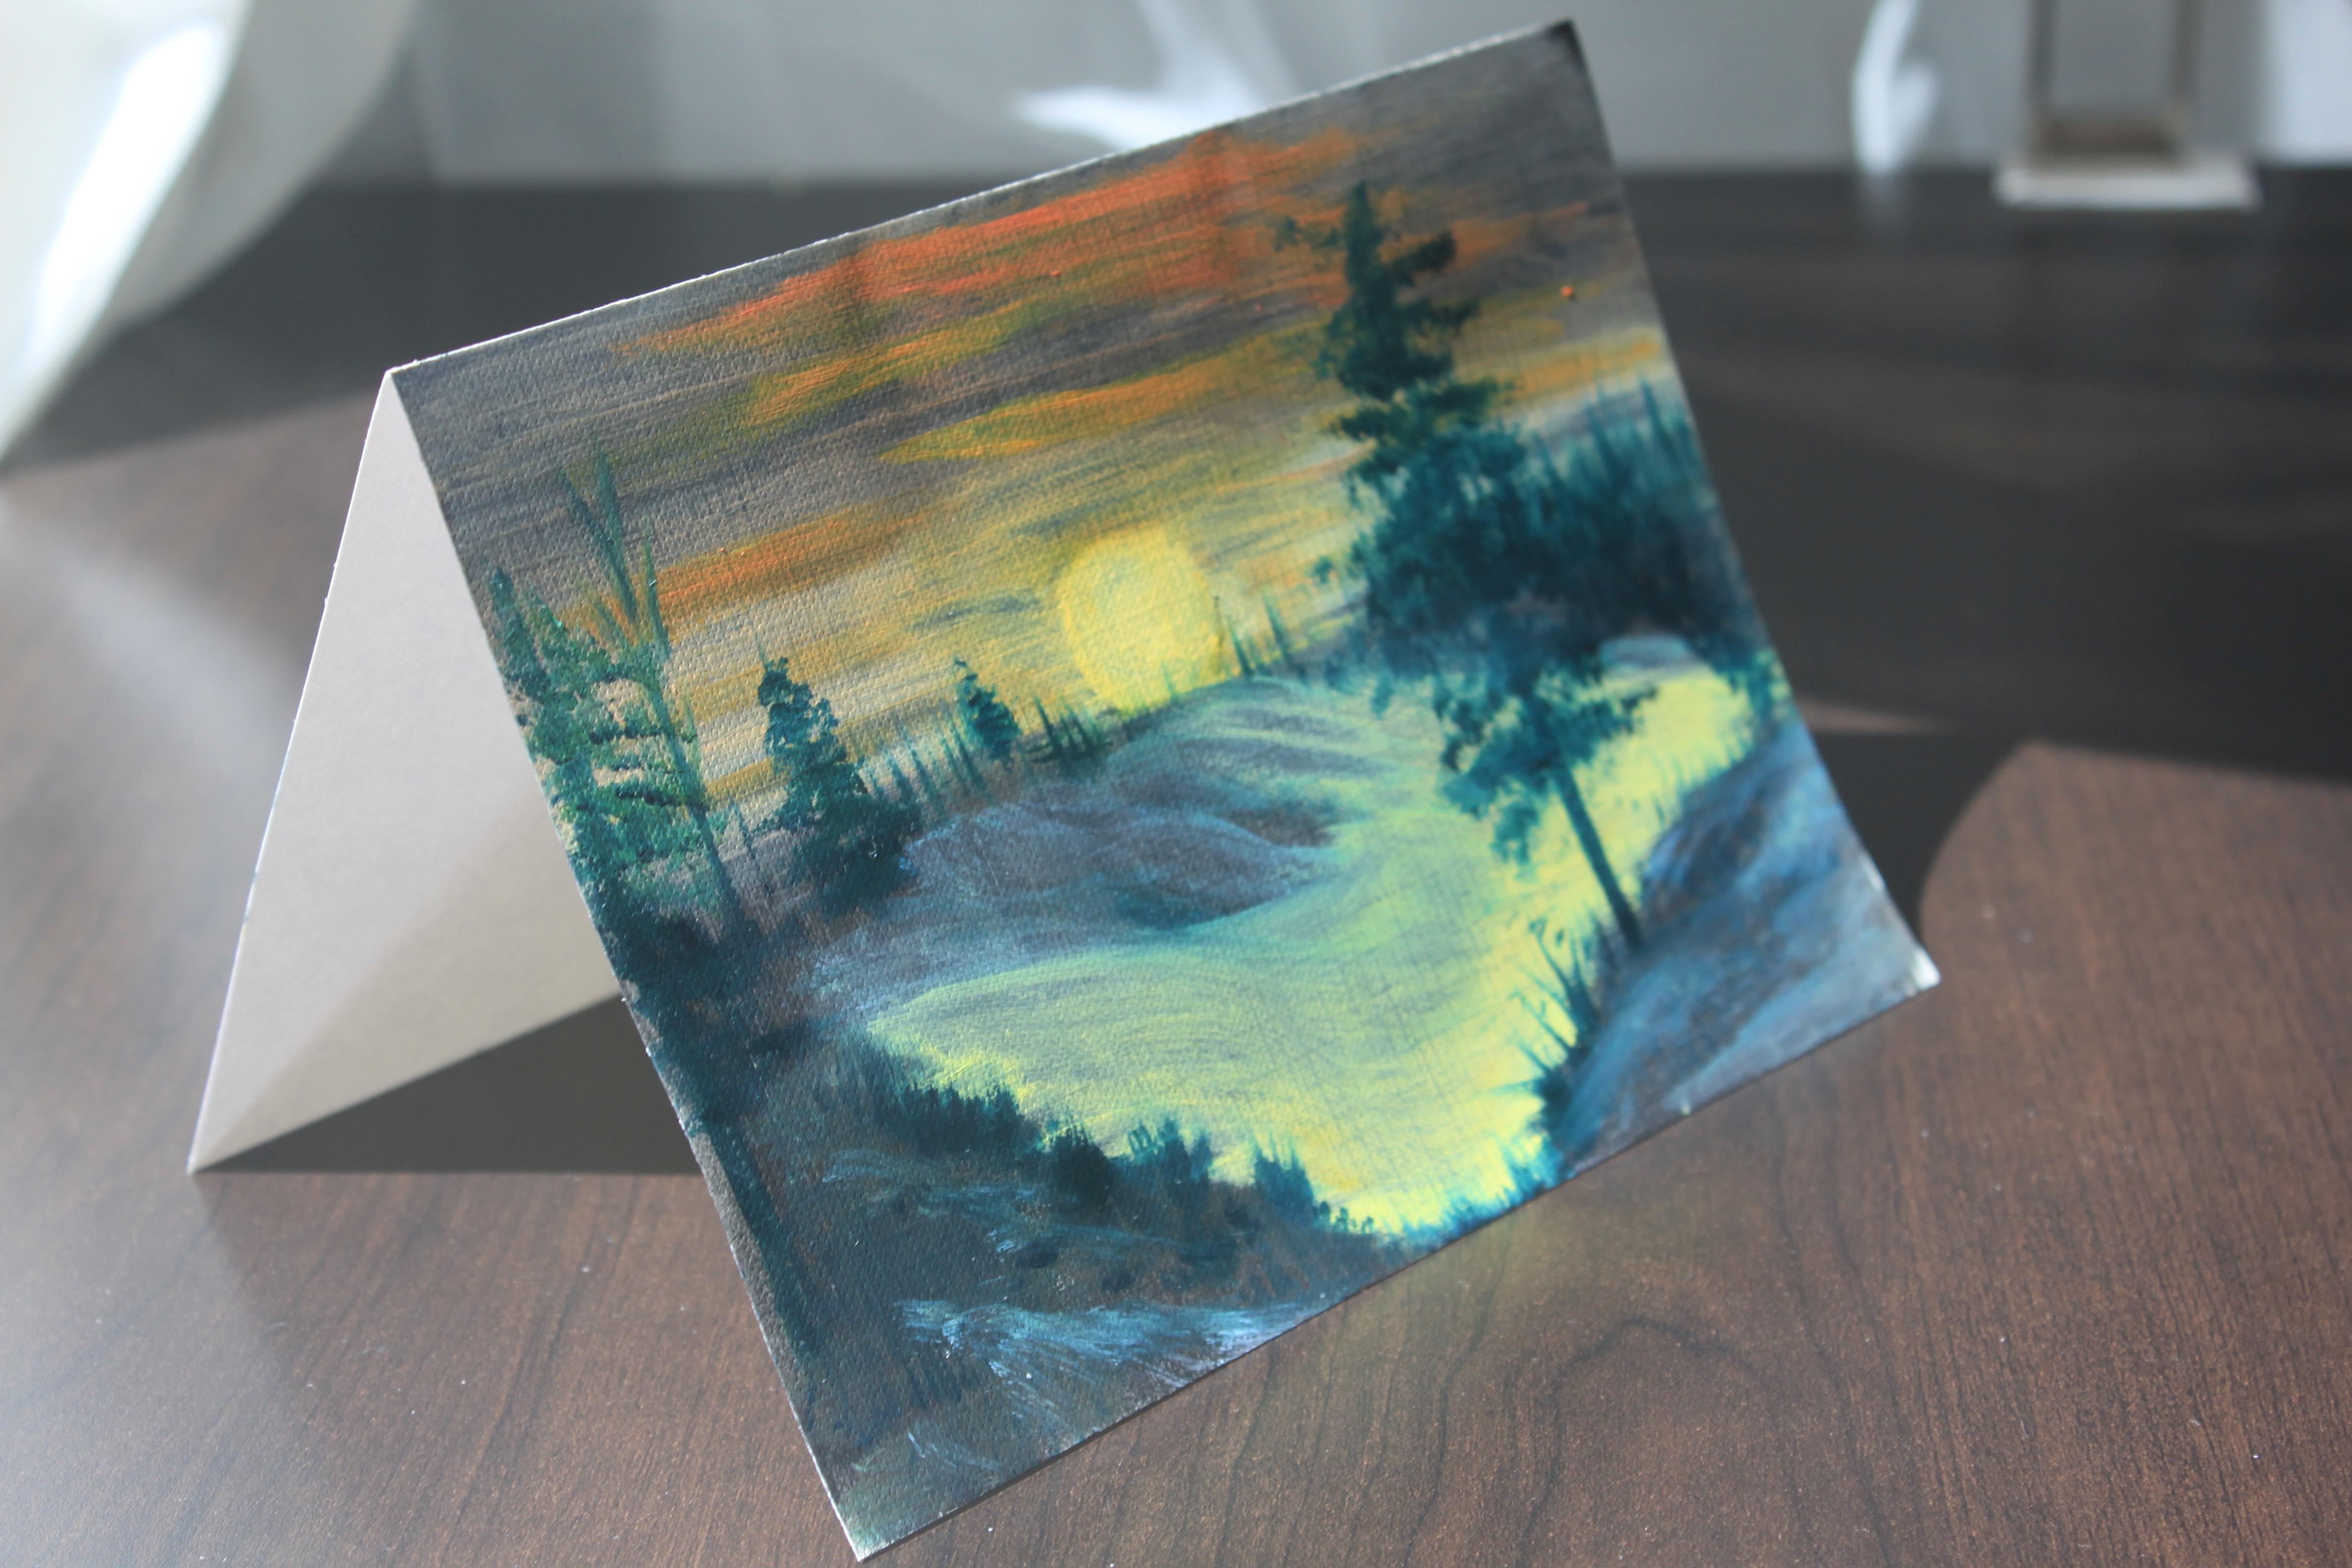 SKU: CARD-OIL-18-003